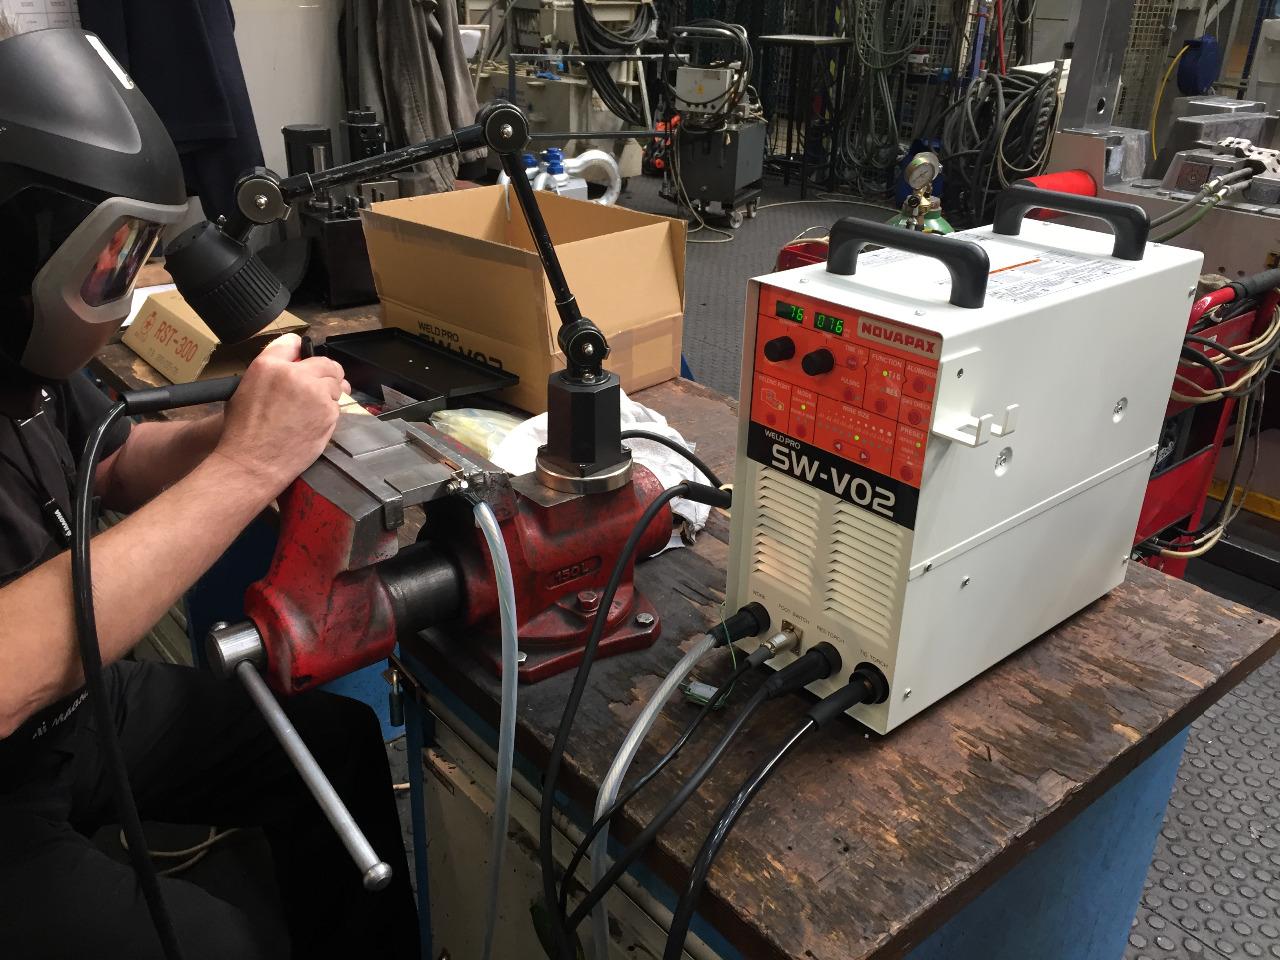 Inovovaná mikro-TIGová svářečka SW-V02 - odporové navařování Praha